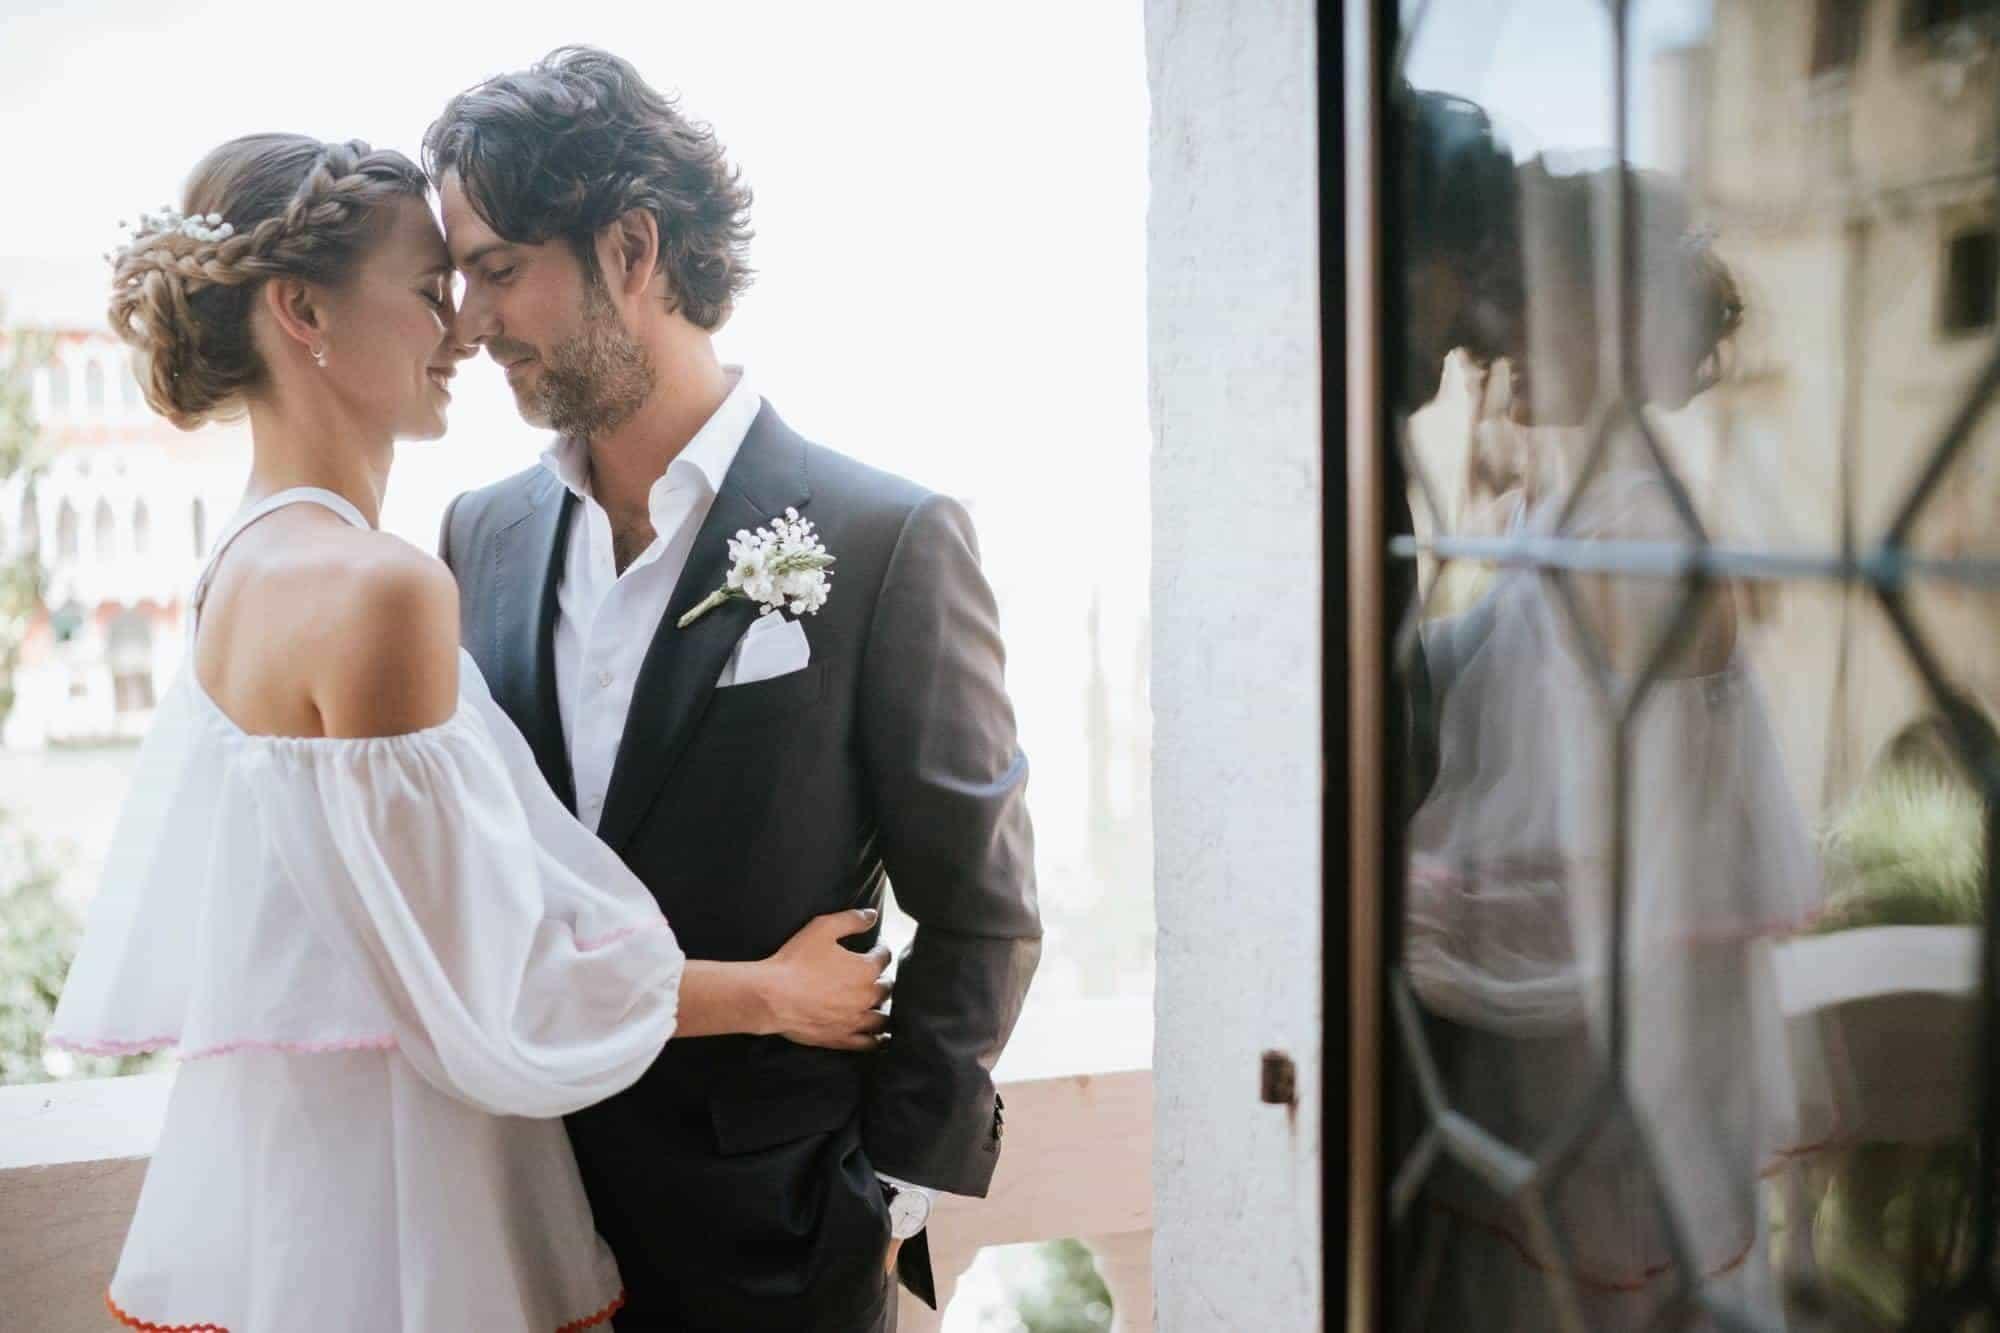 JL wedding 2017 0187 - Luxury Wedding Gallery